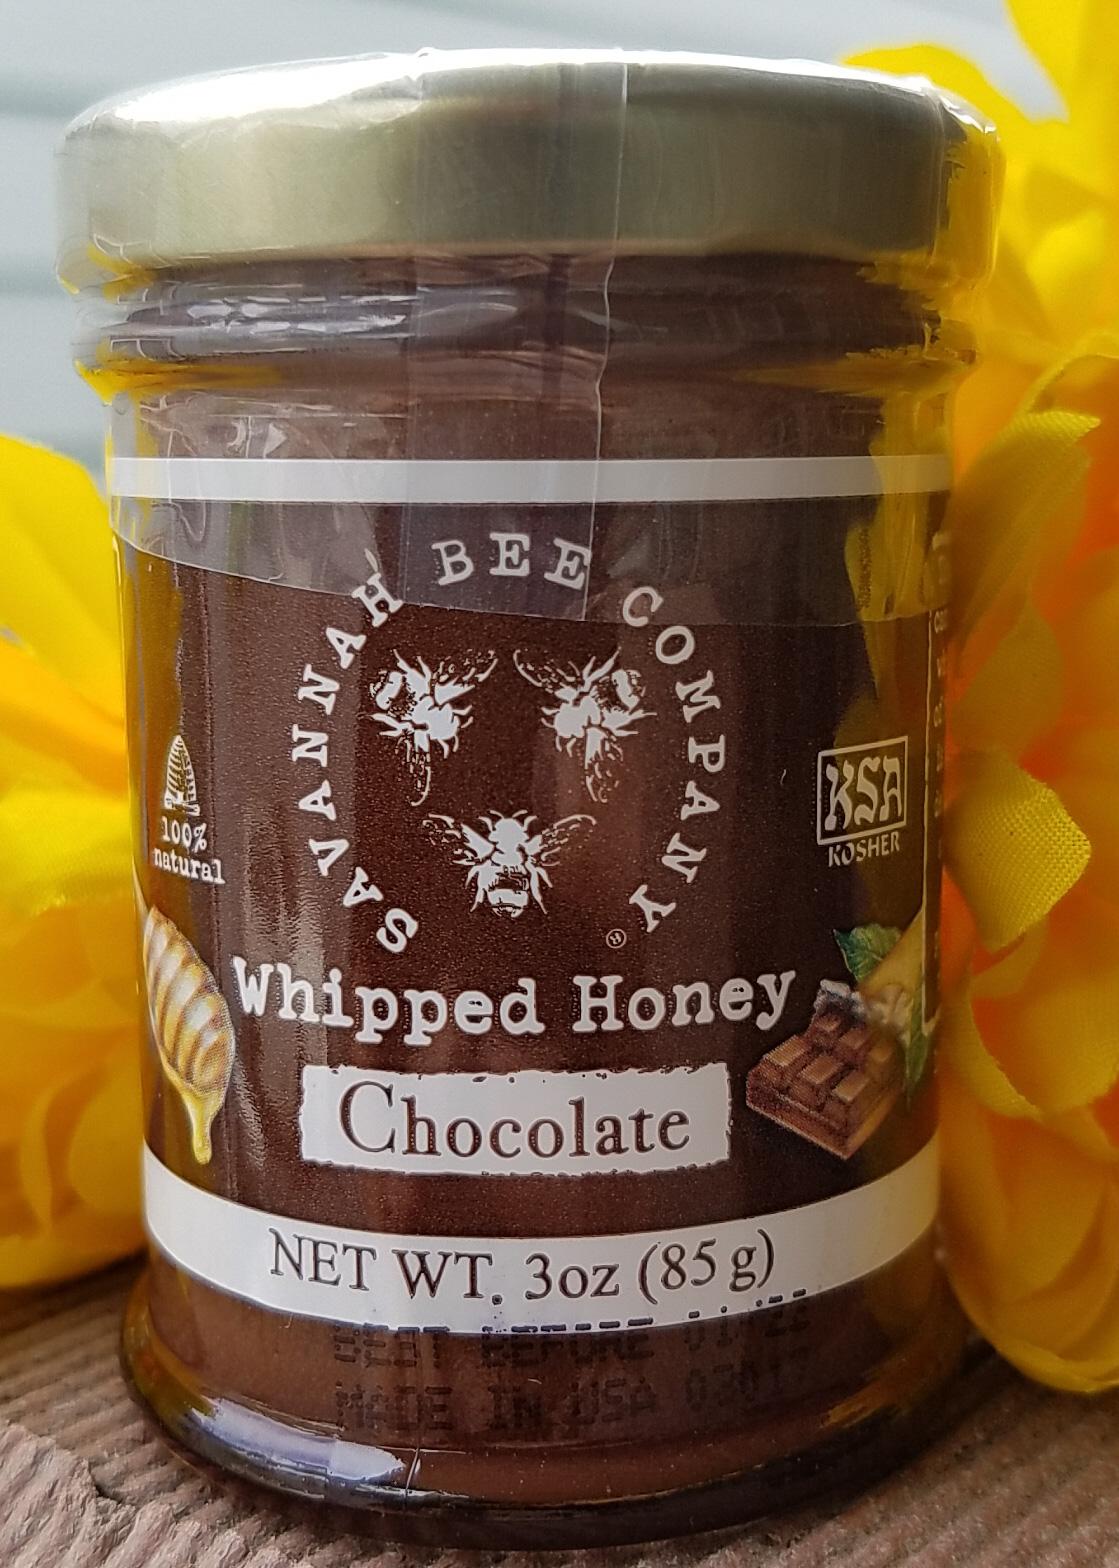 Win a jar of Savannah Bee Whipped Honey Chocolate